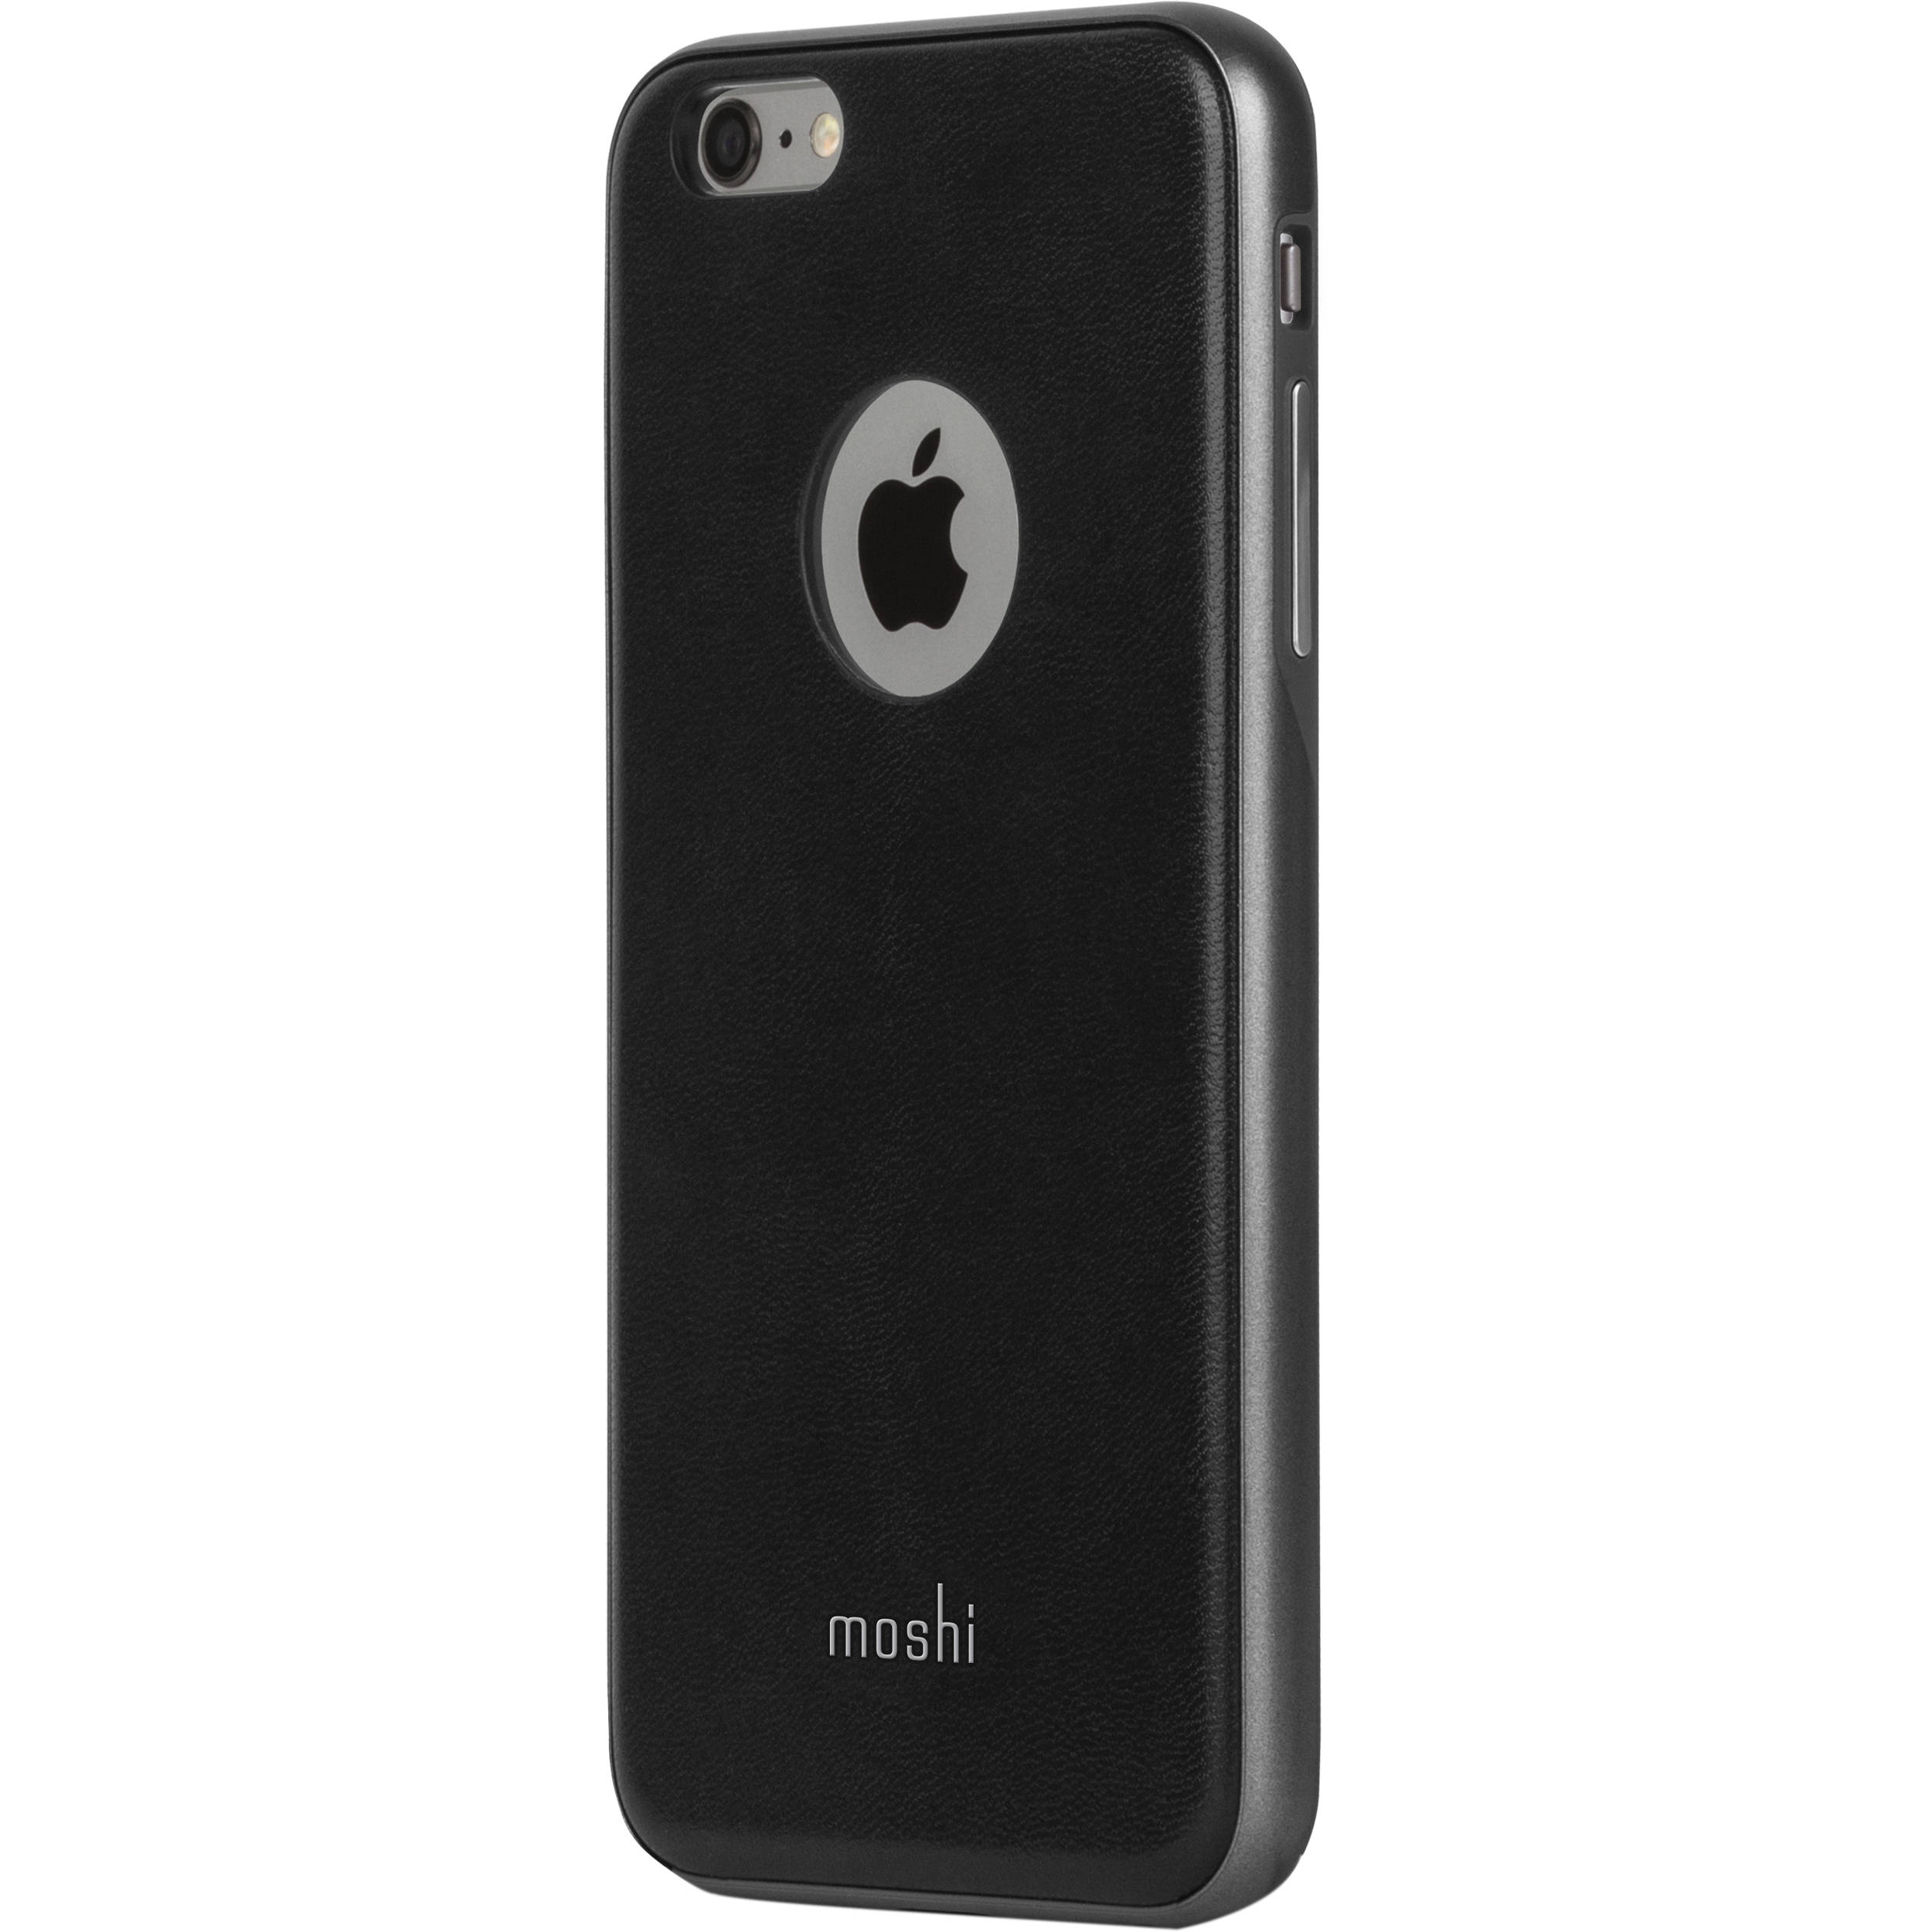 moshi iglaze napa case for iphone 6 plus 6s plus 99mo080002 b h. Black Bedroom Furniture Sets. Home Design Ideas